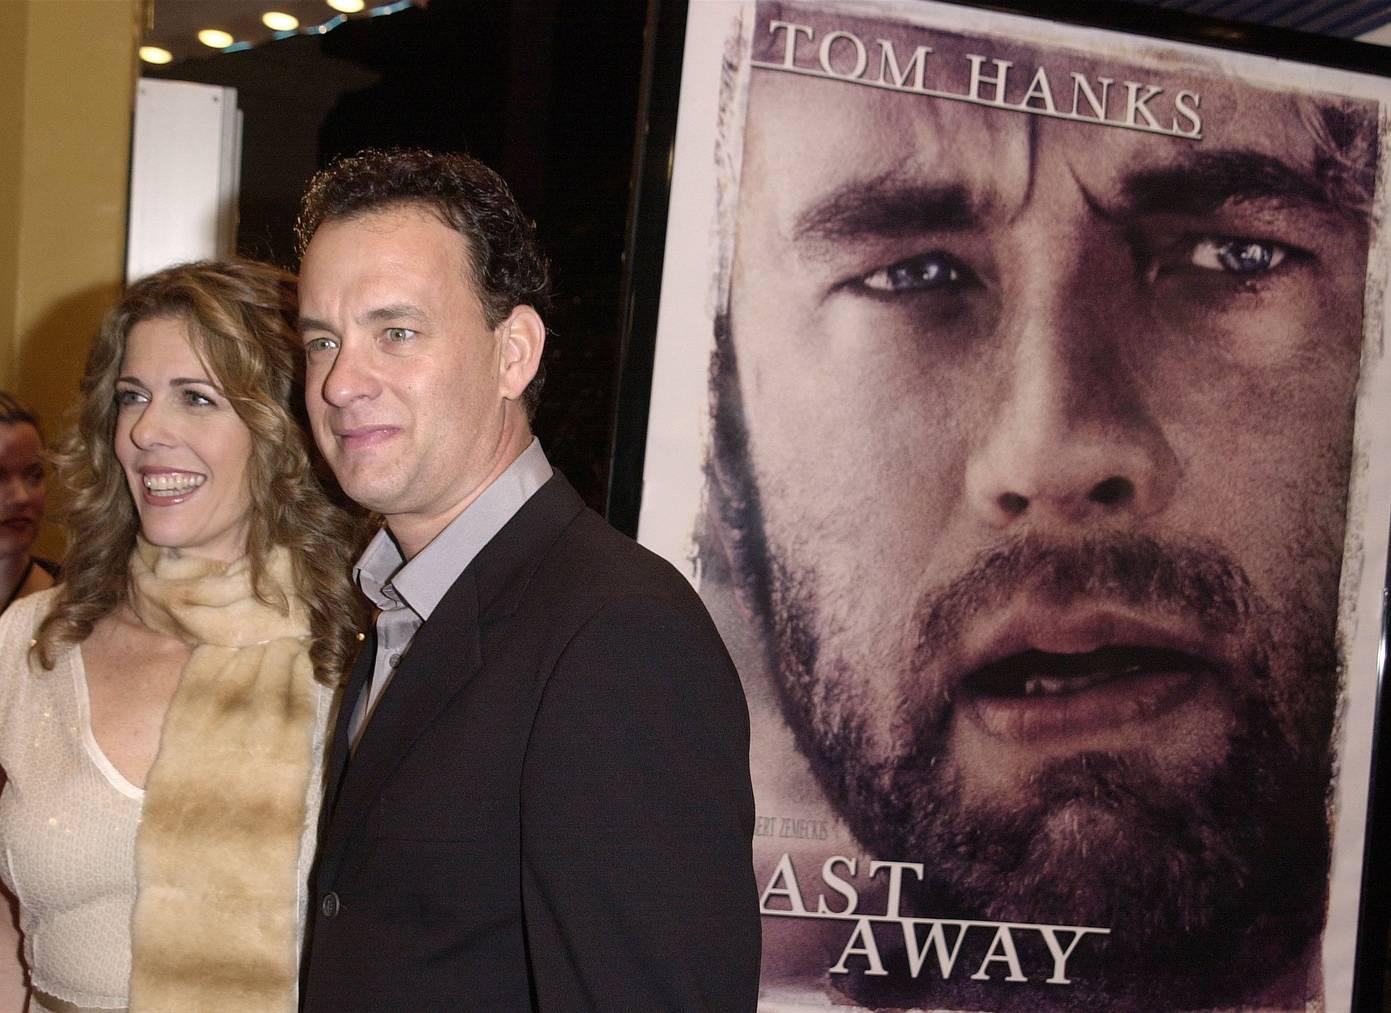 Tom Hanks spielte in Cast Away die Hauprolle. (Bild: Getty Images)